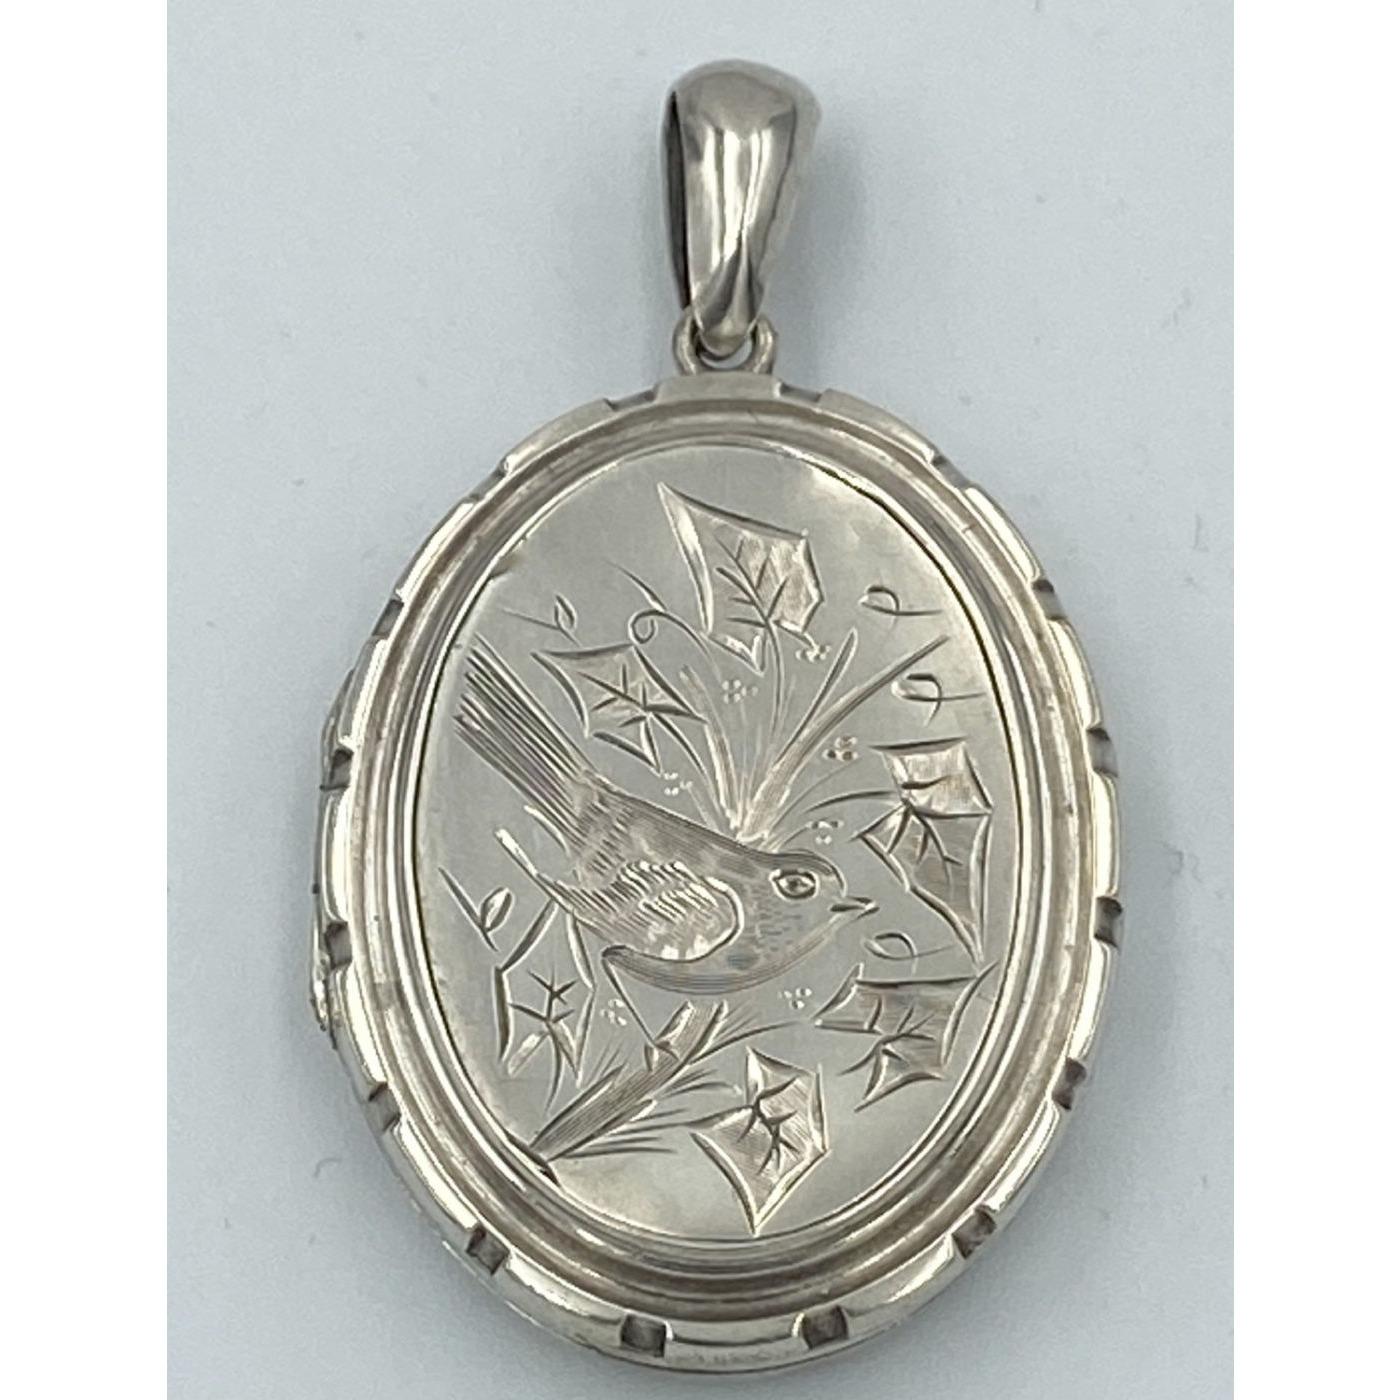 Wonderful Bird Aesthetic Antique English Silver Locket